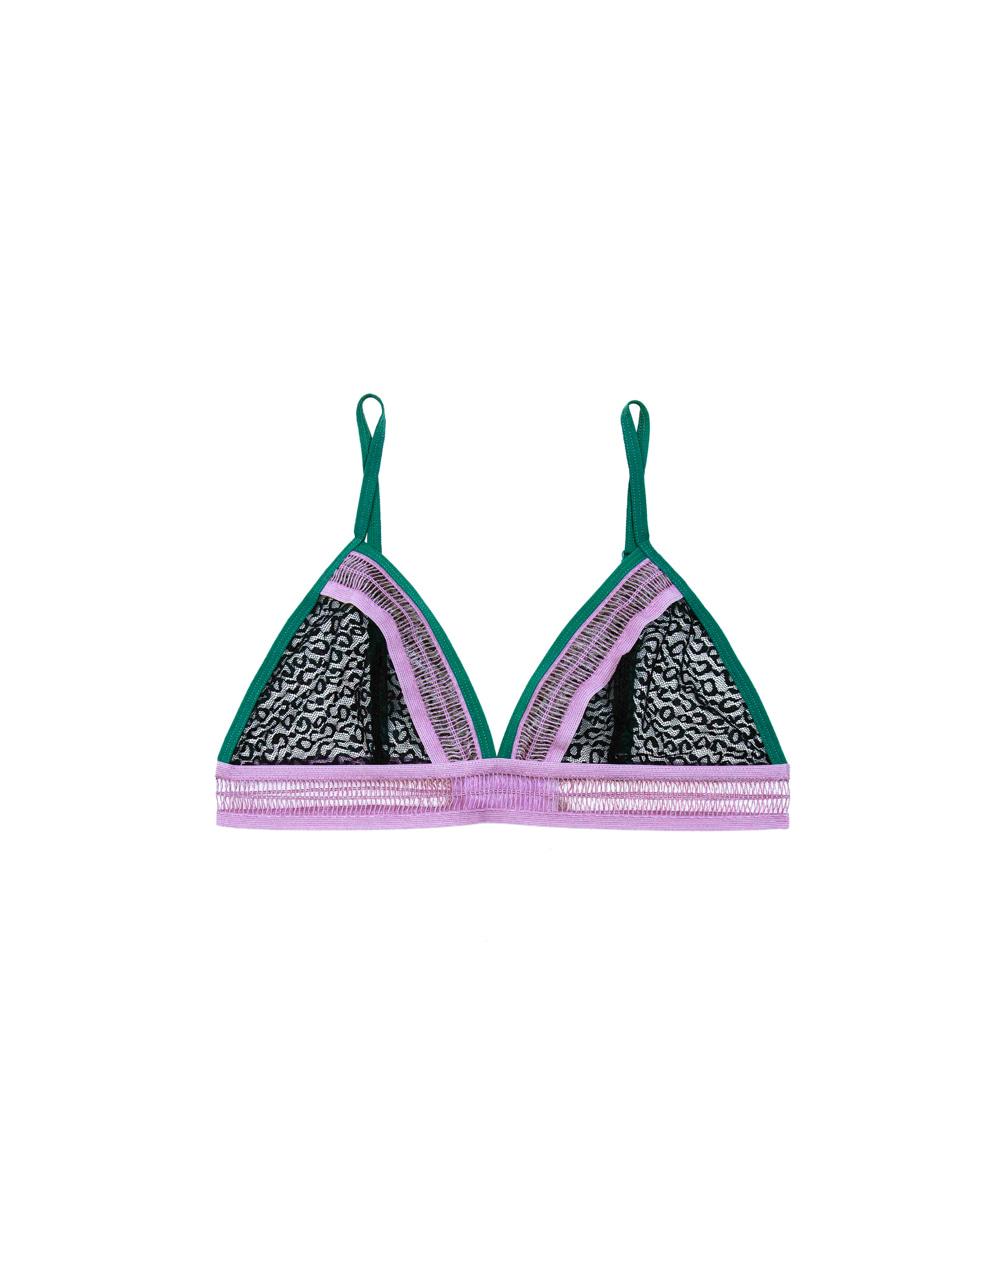 lingerie bra without underwires Imani Pink Prairie 32 € Girls In Paris photo 5